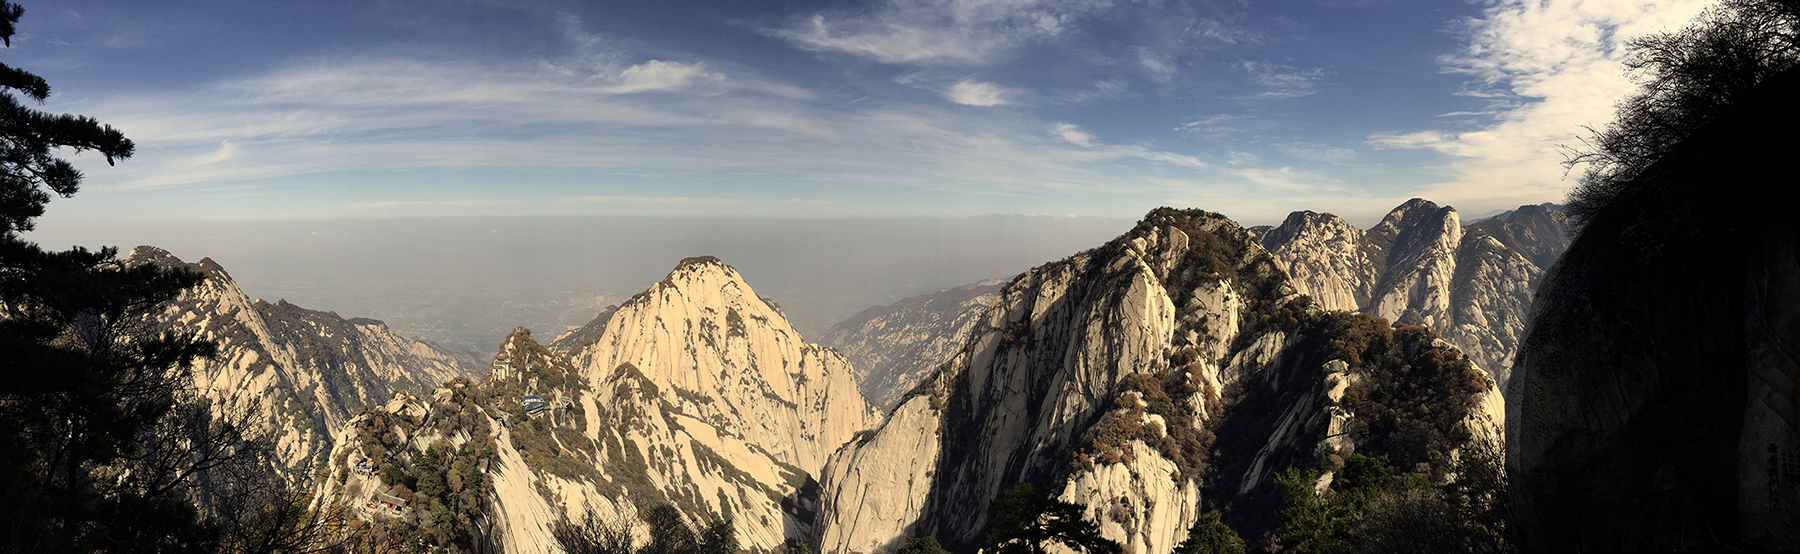 Looking East from the East Peak of Mount Hua ,  2016  © Zhang Huajie,